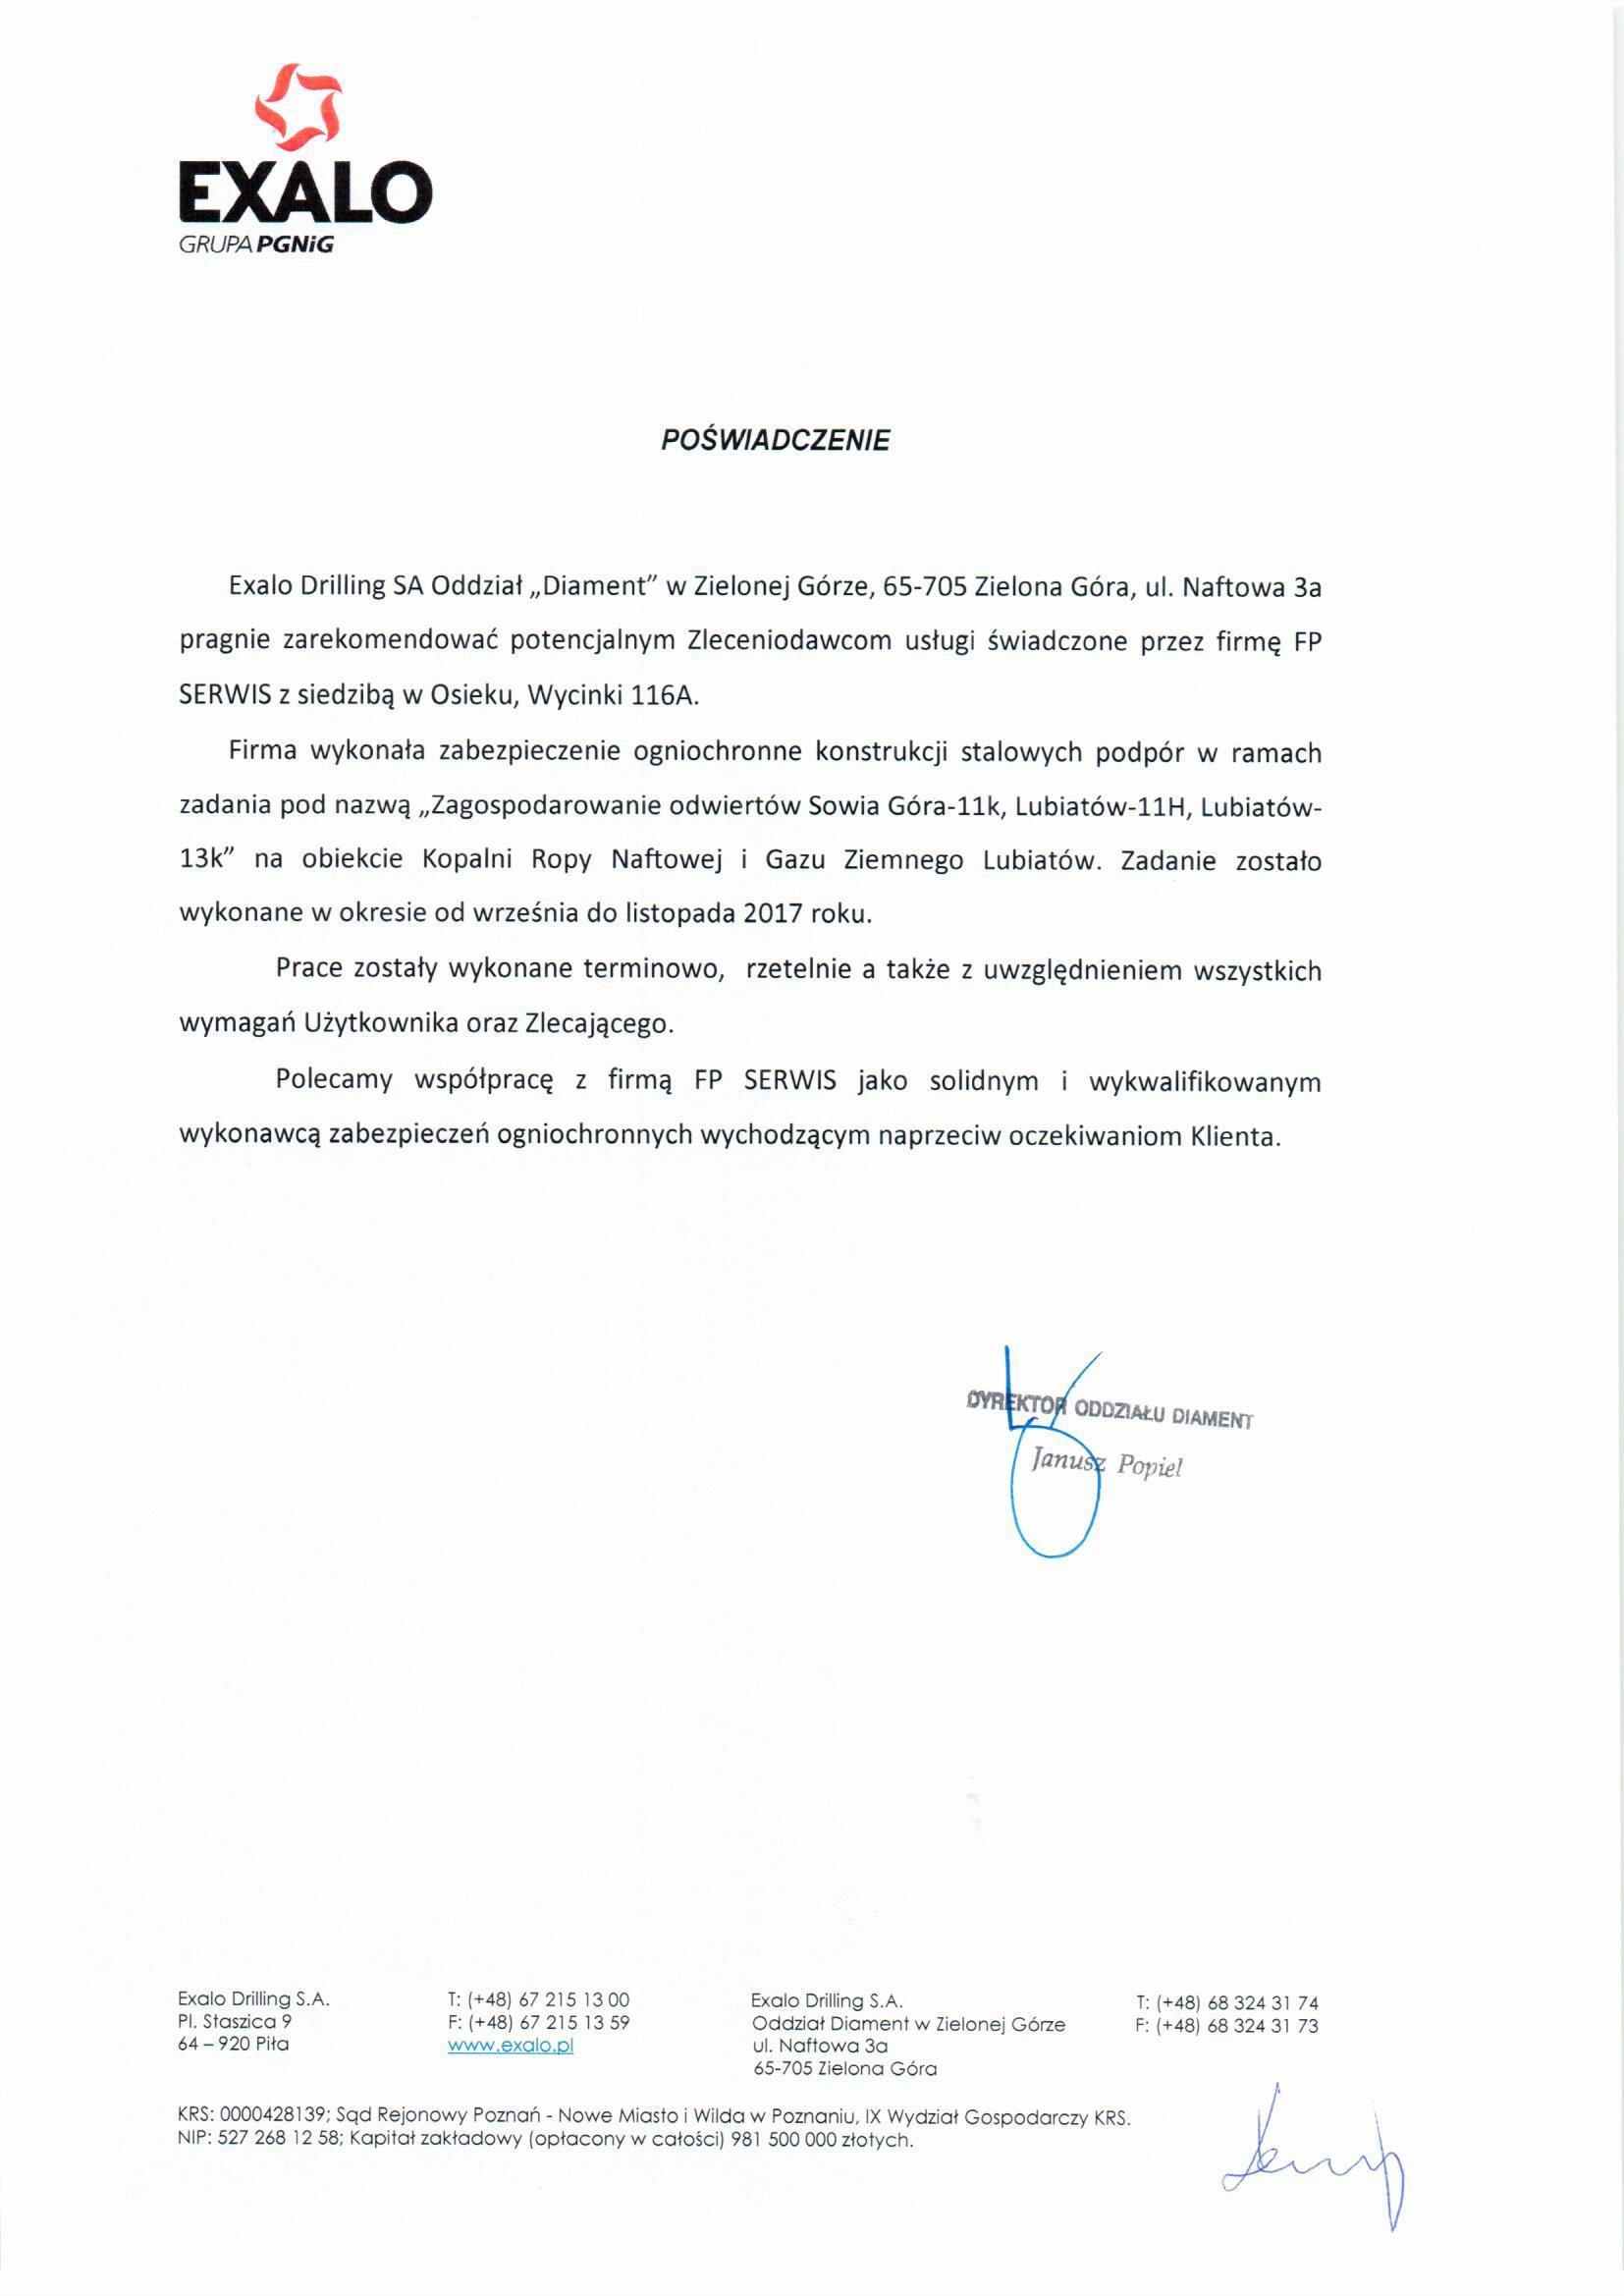 Exalo – Referencje FP Serwis